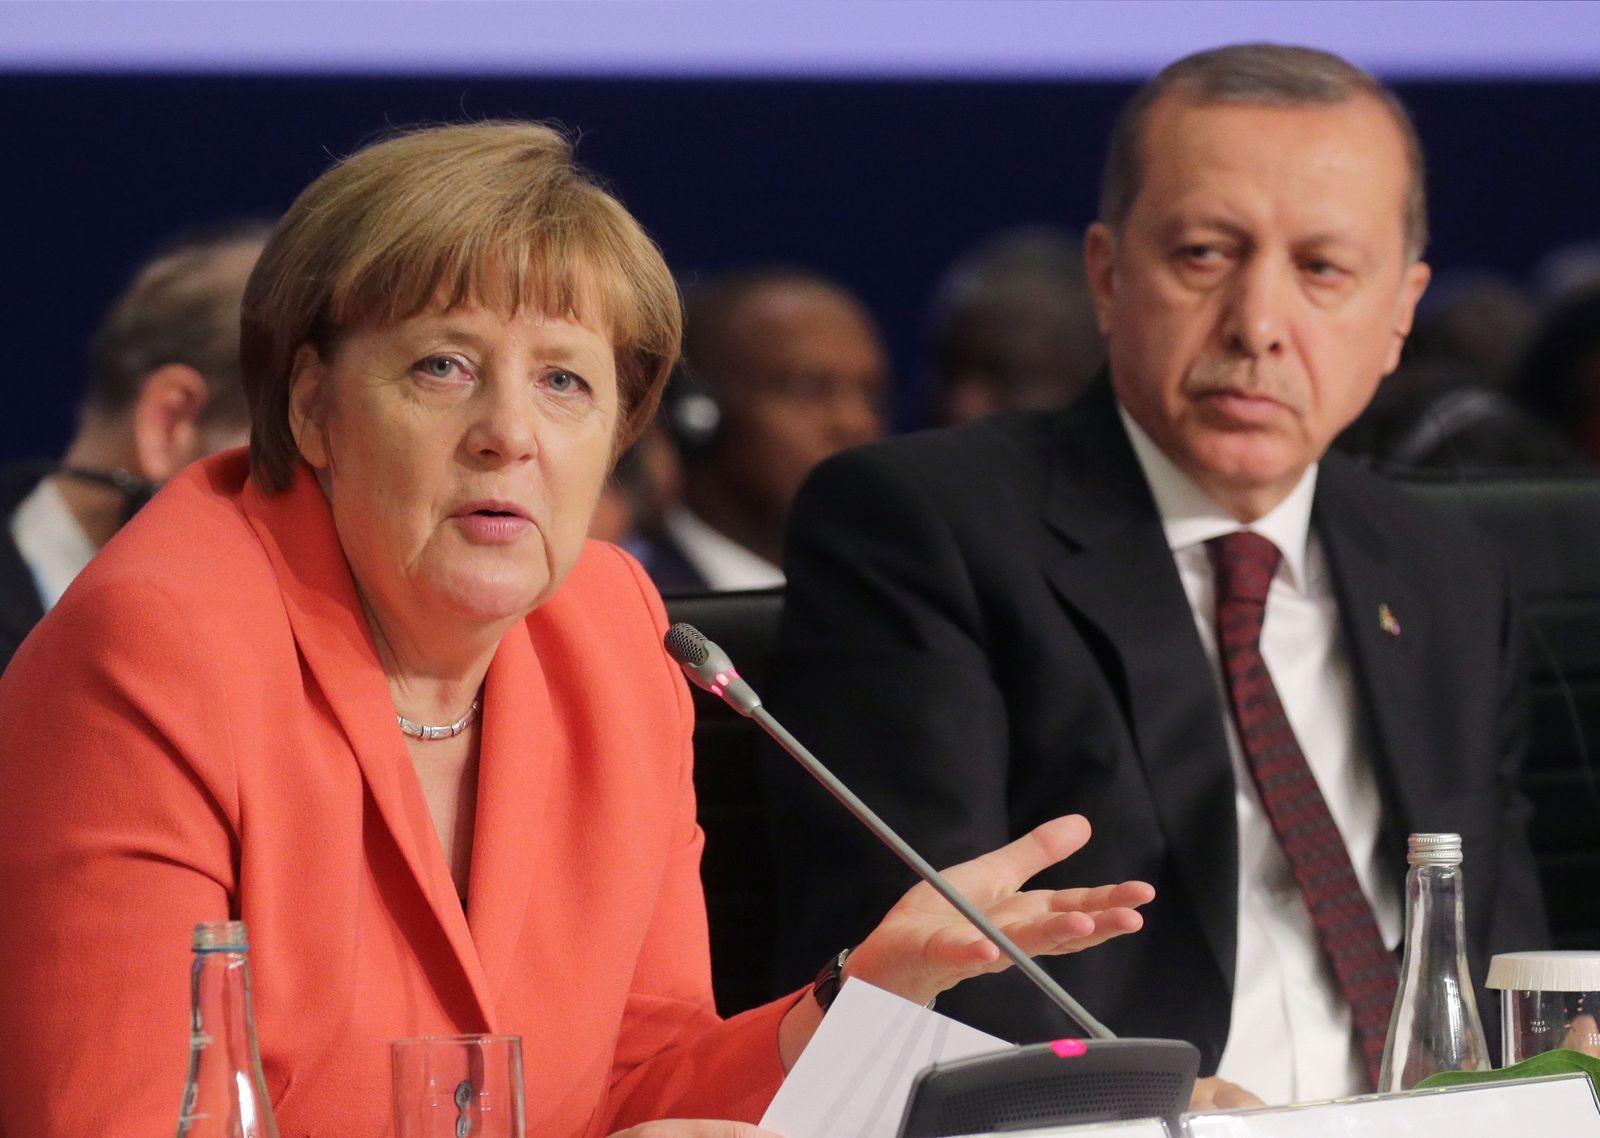 Armenien-Resolution - Merkel / Erdogan